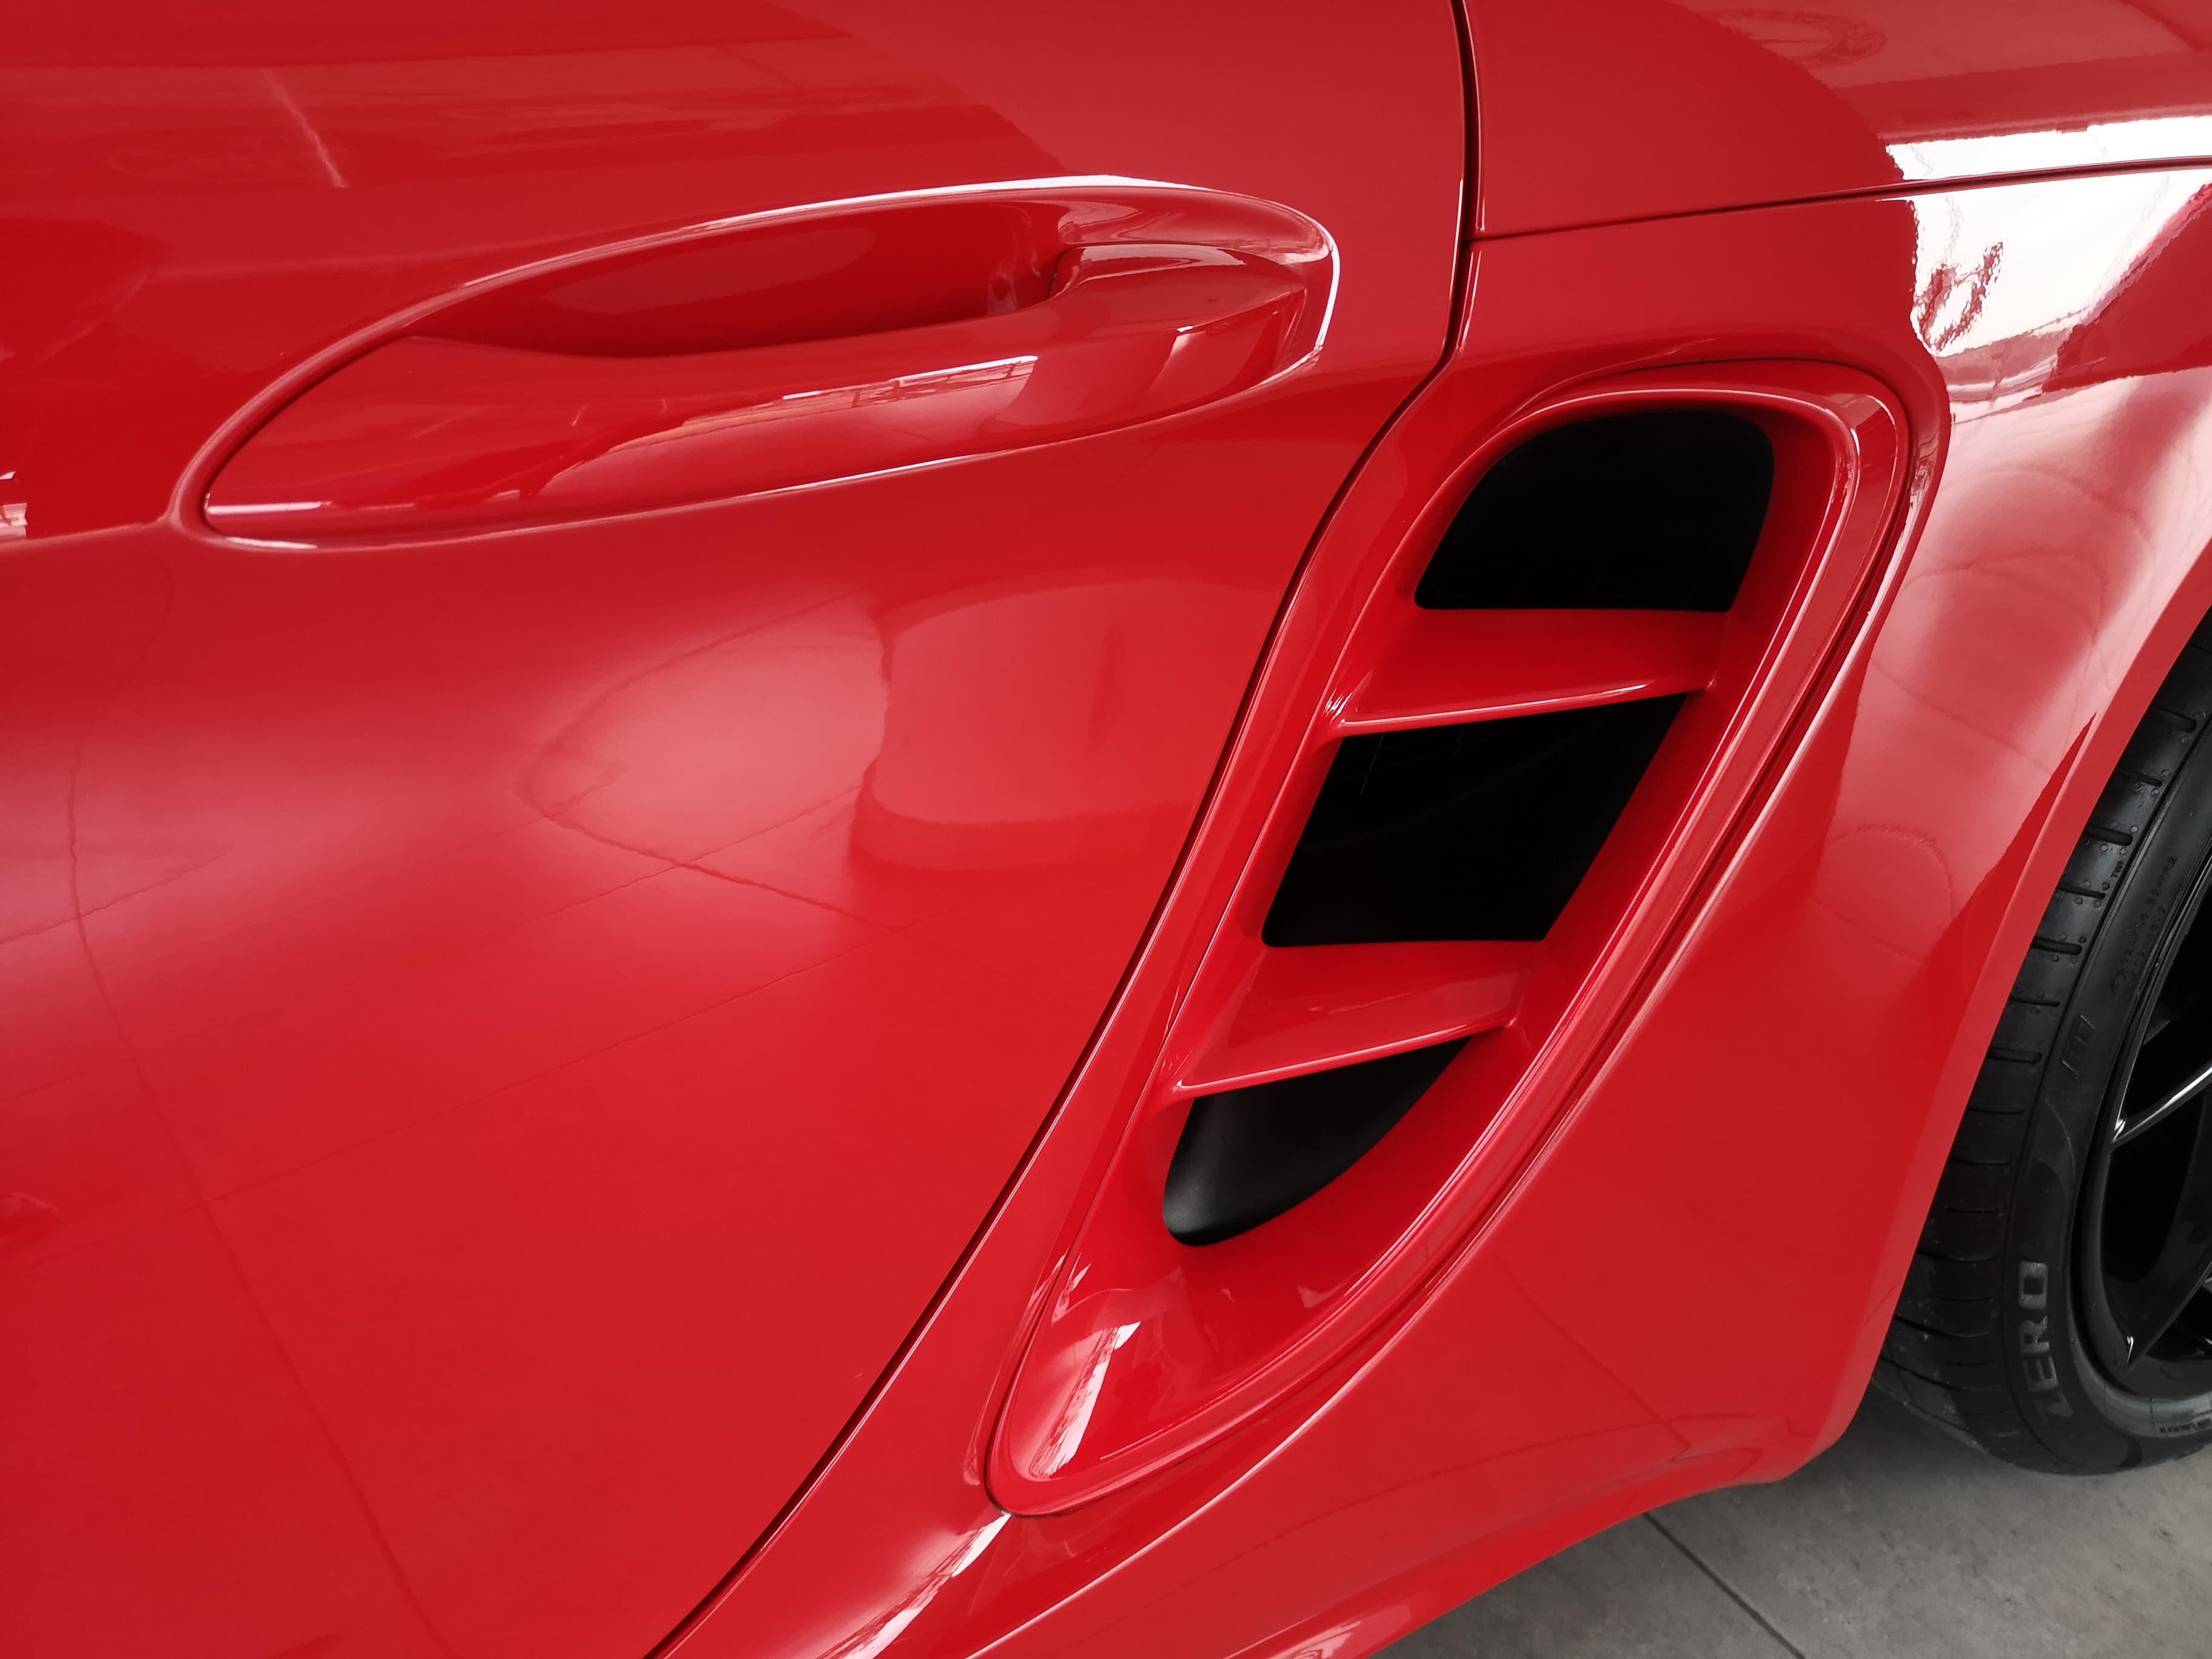 Porsche 718 Boxster Turbo – 2018